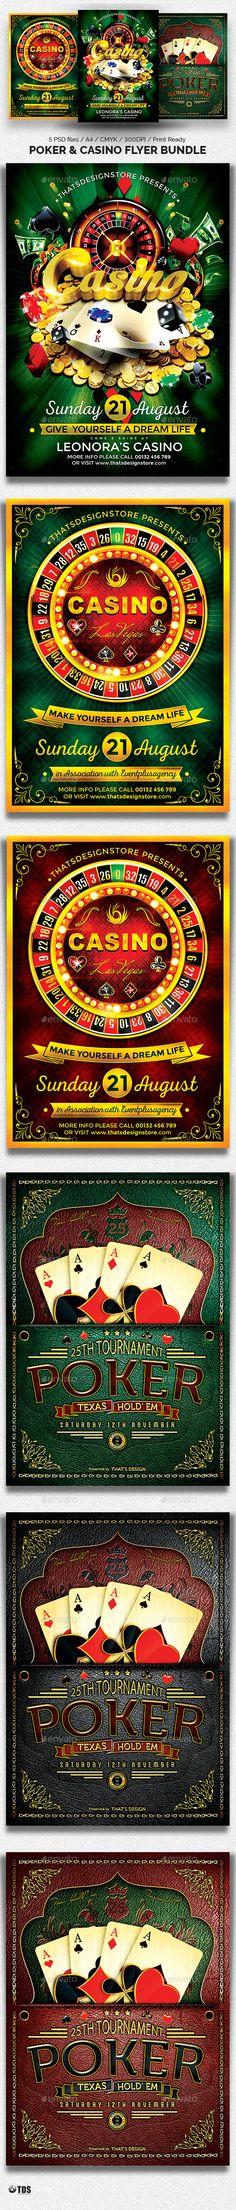 Casino Jackpot Gewinner - 453038